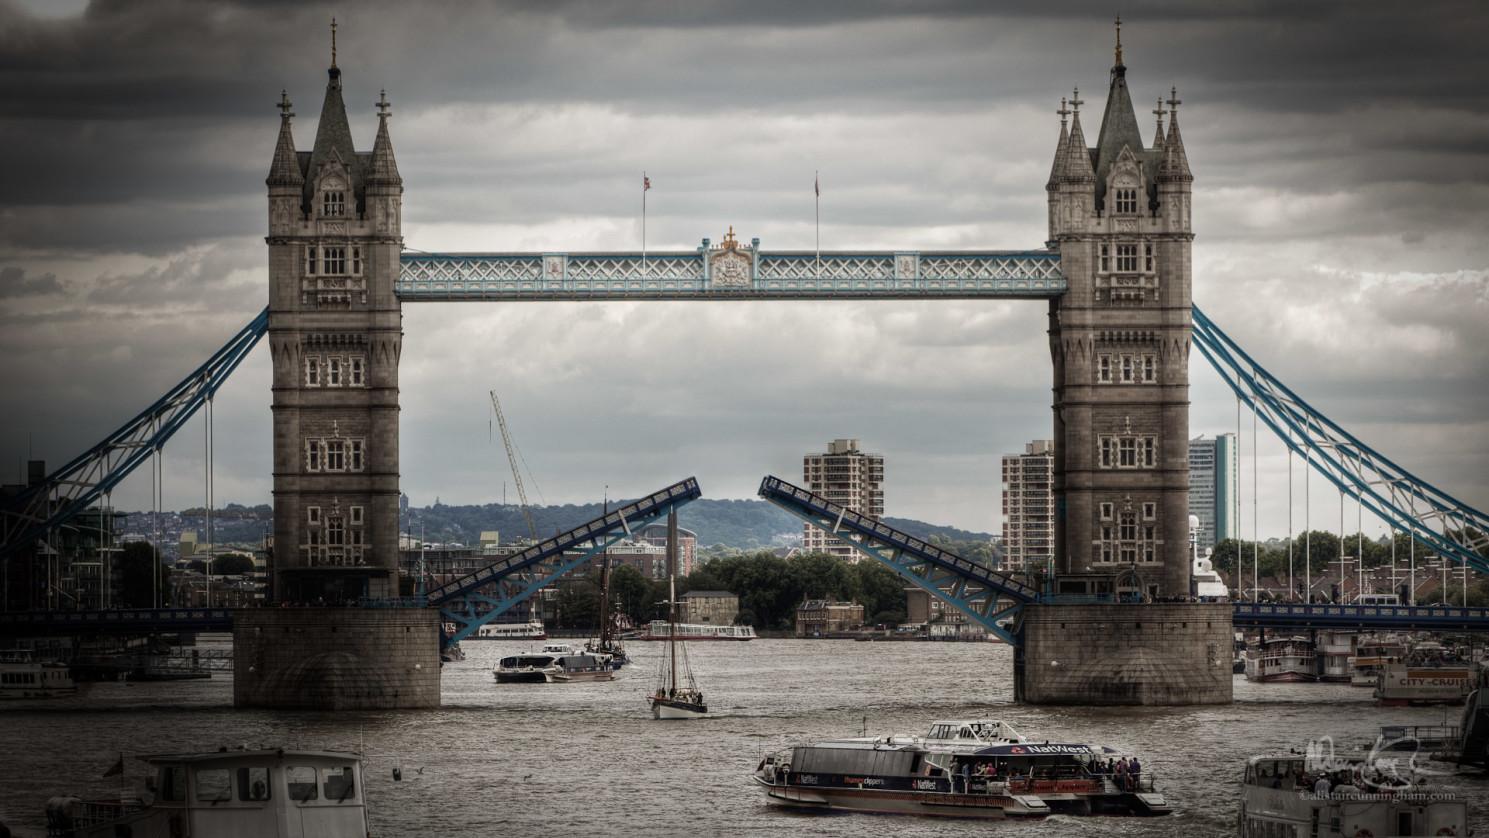 The Opening of Tower Bridge